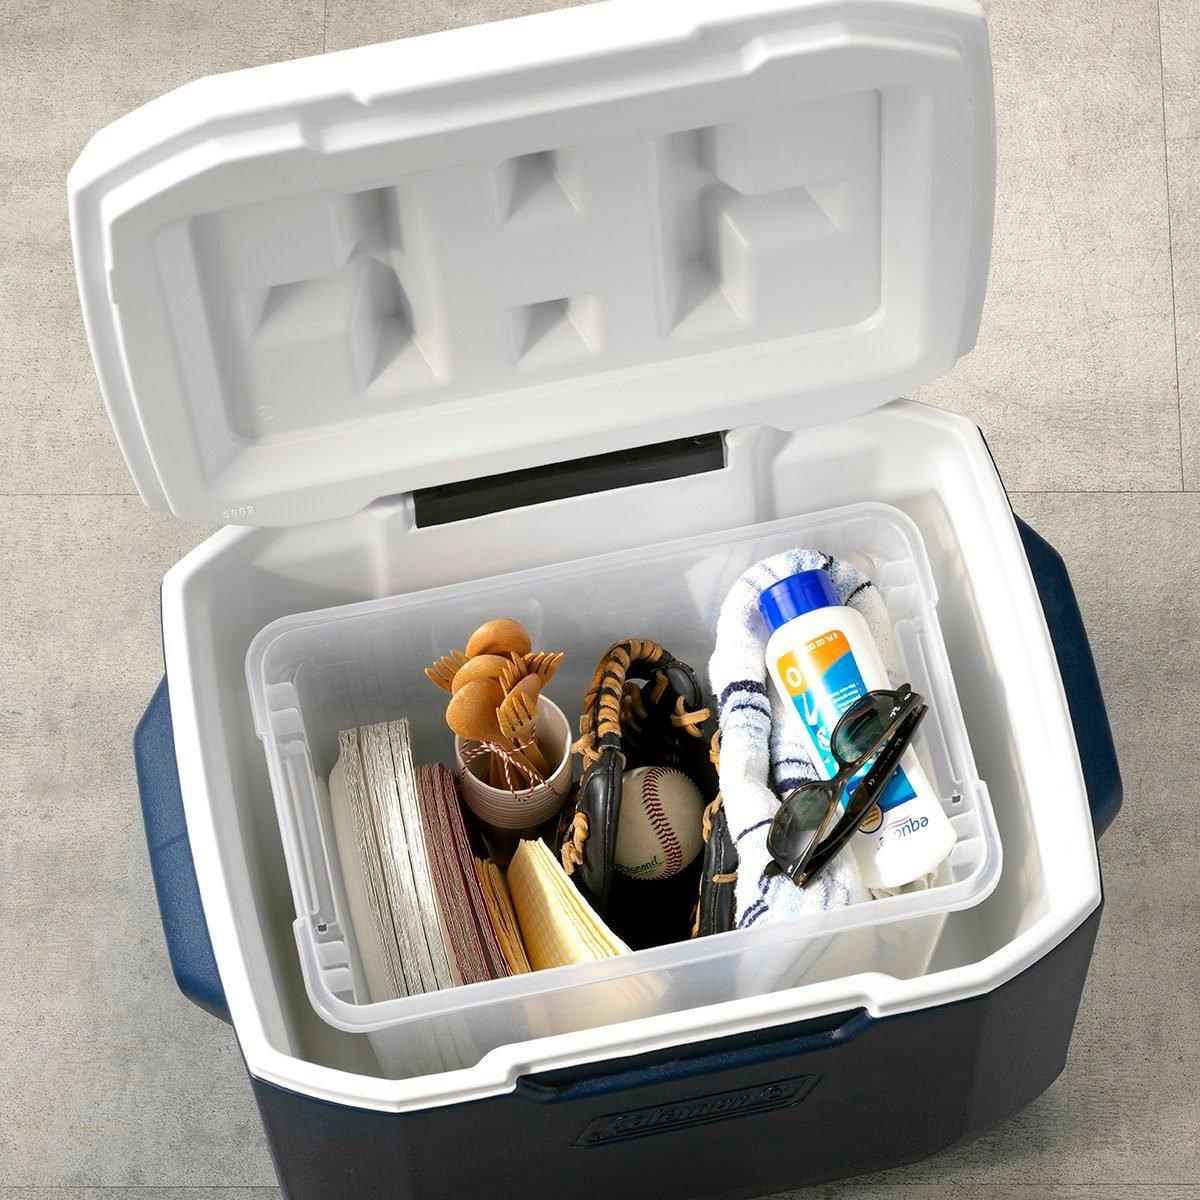 THGKH19, Kitchen Hack Storing tailgate essentials